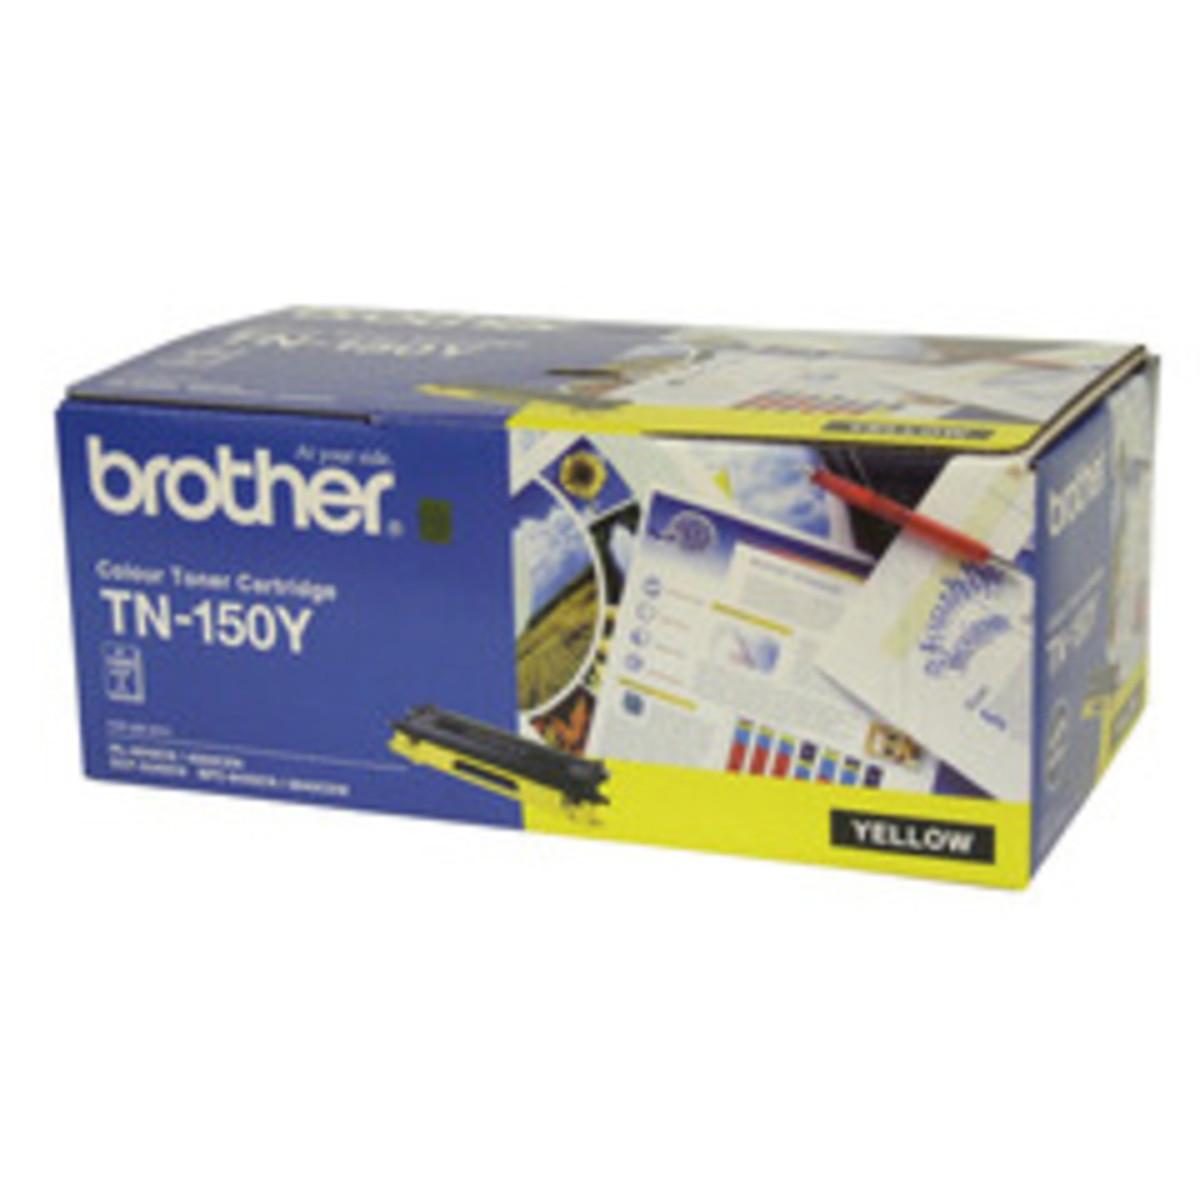 Brother TN-150Y Yellow Toner Cartridge